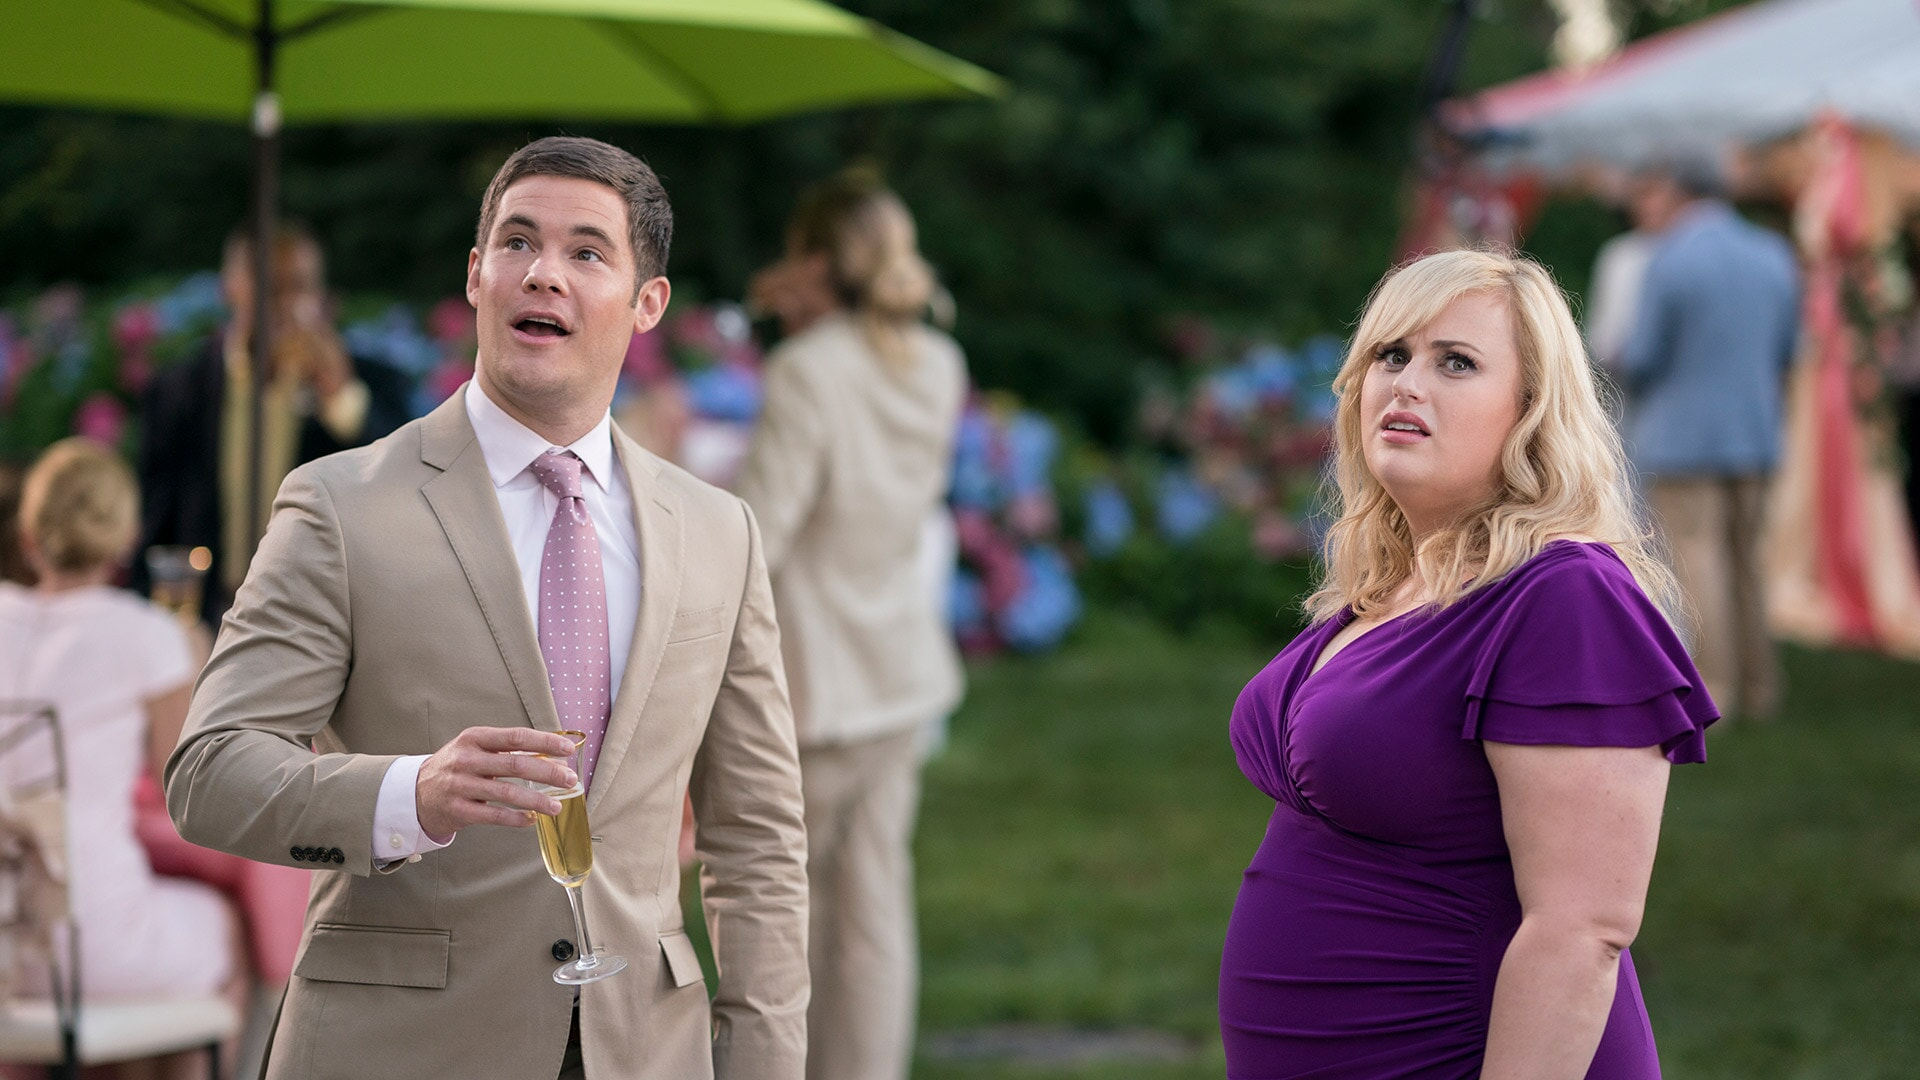 (L-R) ADAM DEVINE as Josh and REBEL WILSON as Natalie